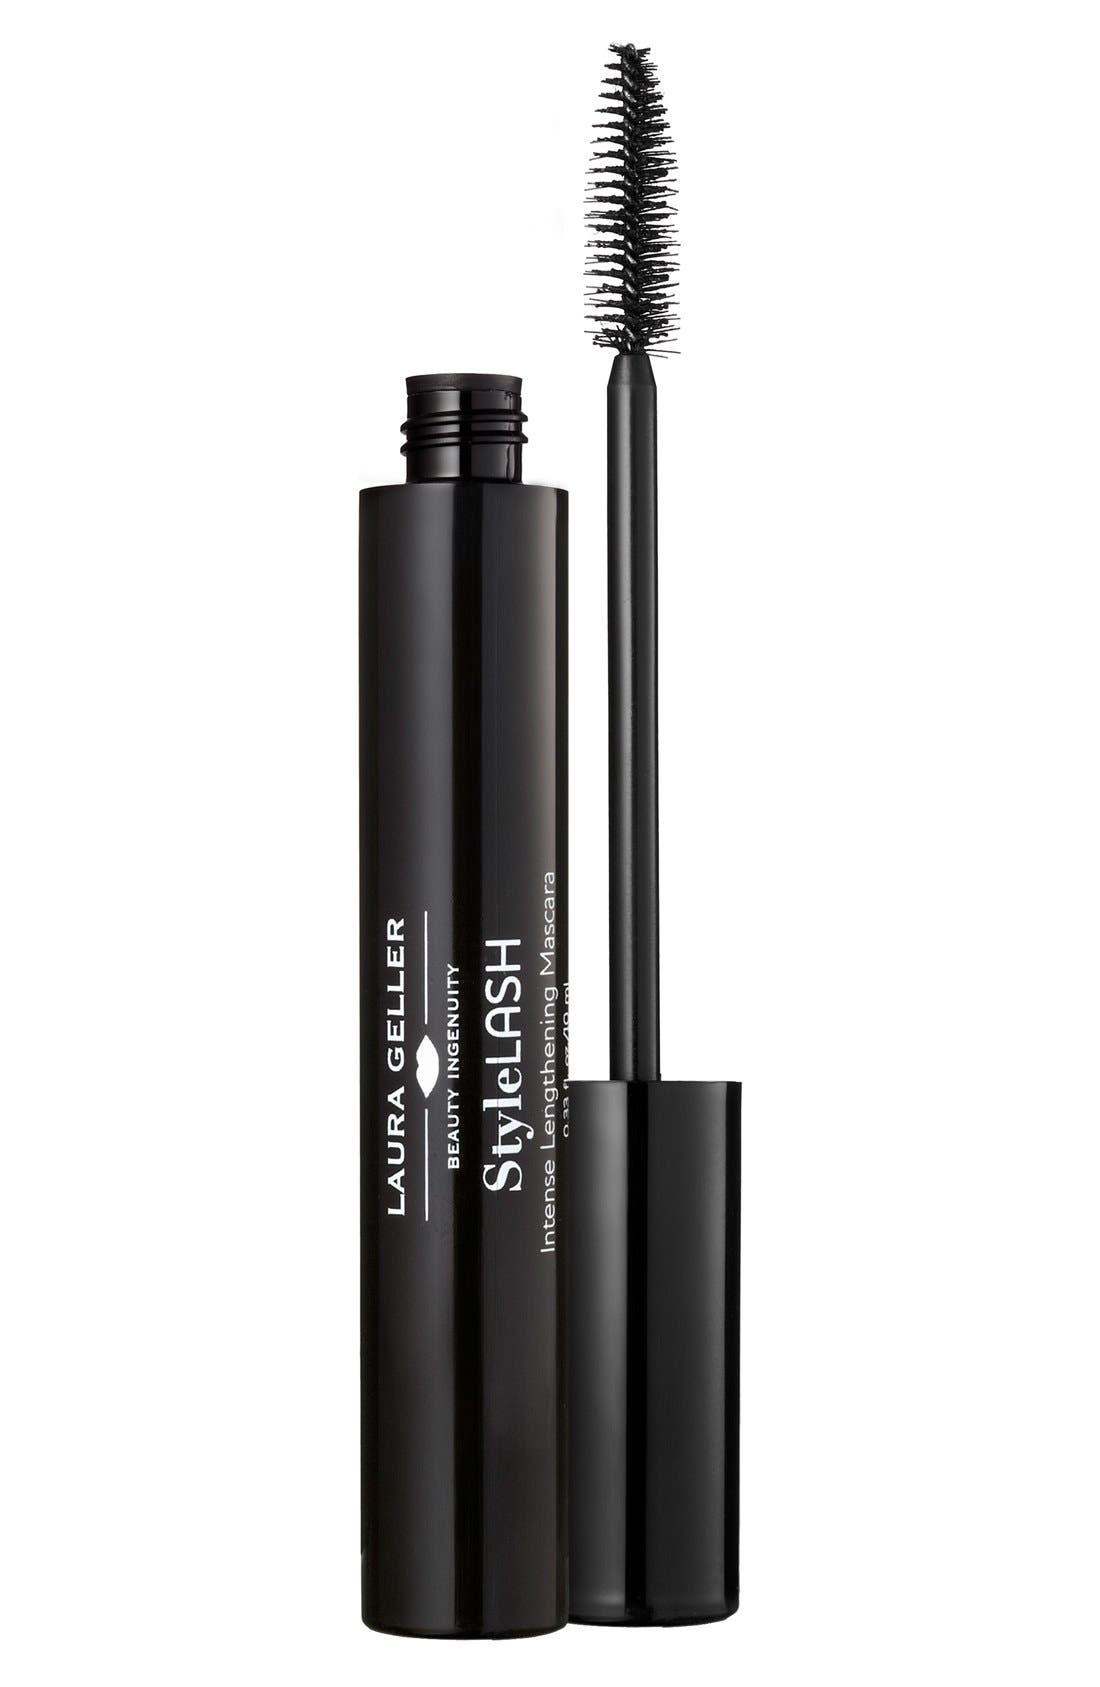 Laura Geller Beauty StyleLASH Intense Lengthening Mascara